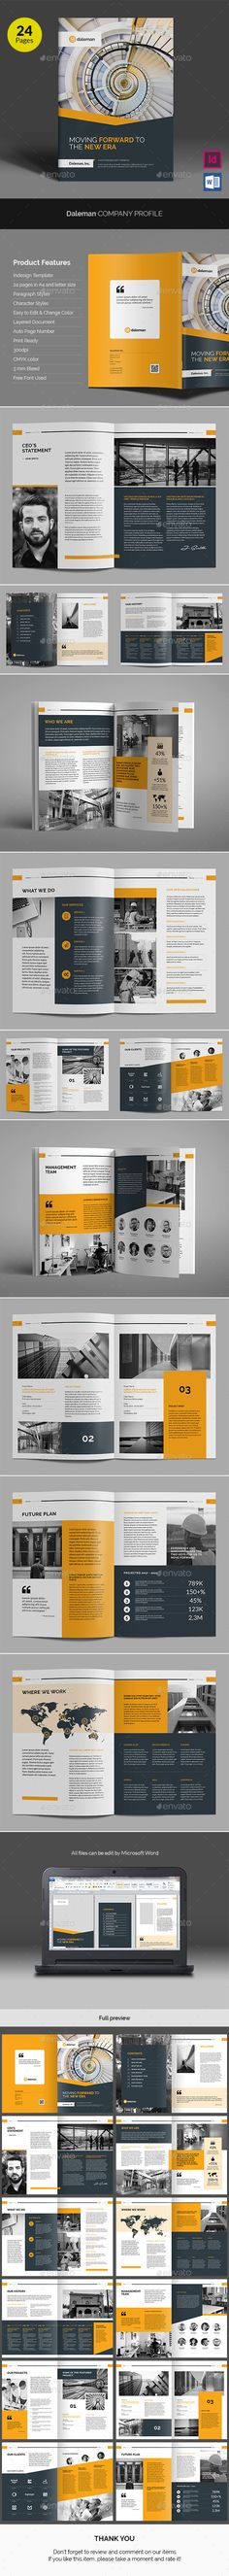 Daleman Company Profile v02 - Corporate Brochures. Download link: https://graphicriver.net/item/daleman-company-profile-v02/17802281?ref=heriwibowo